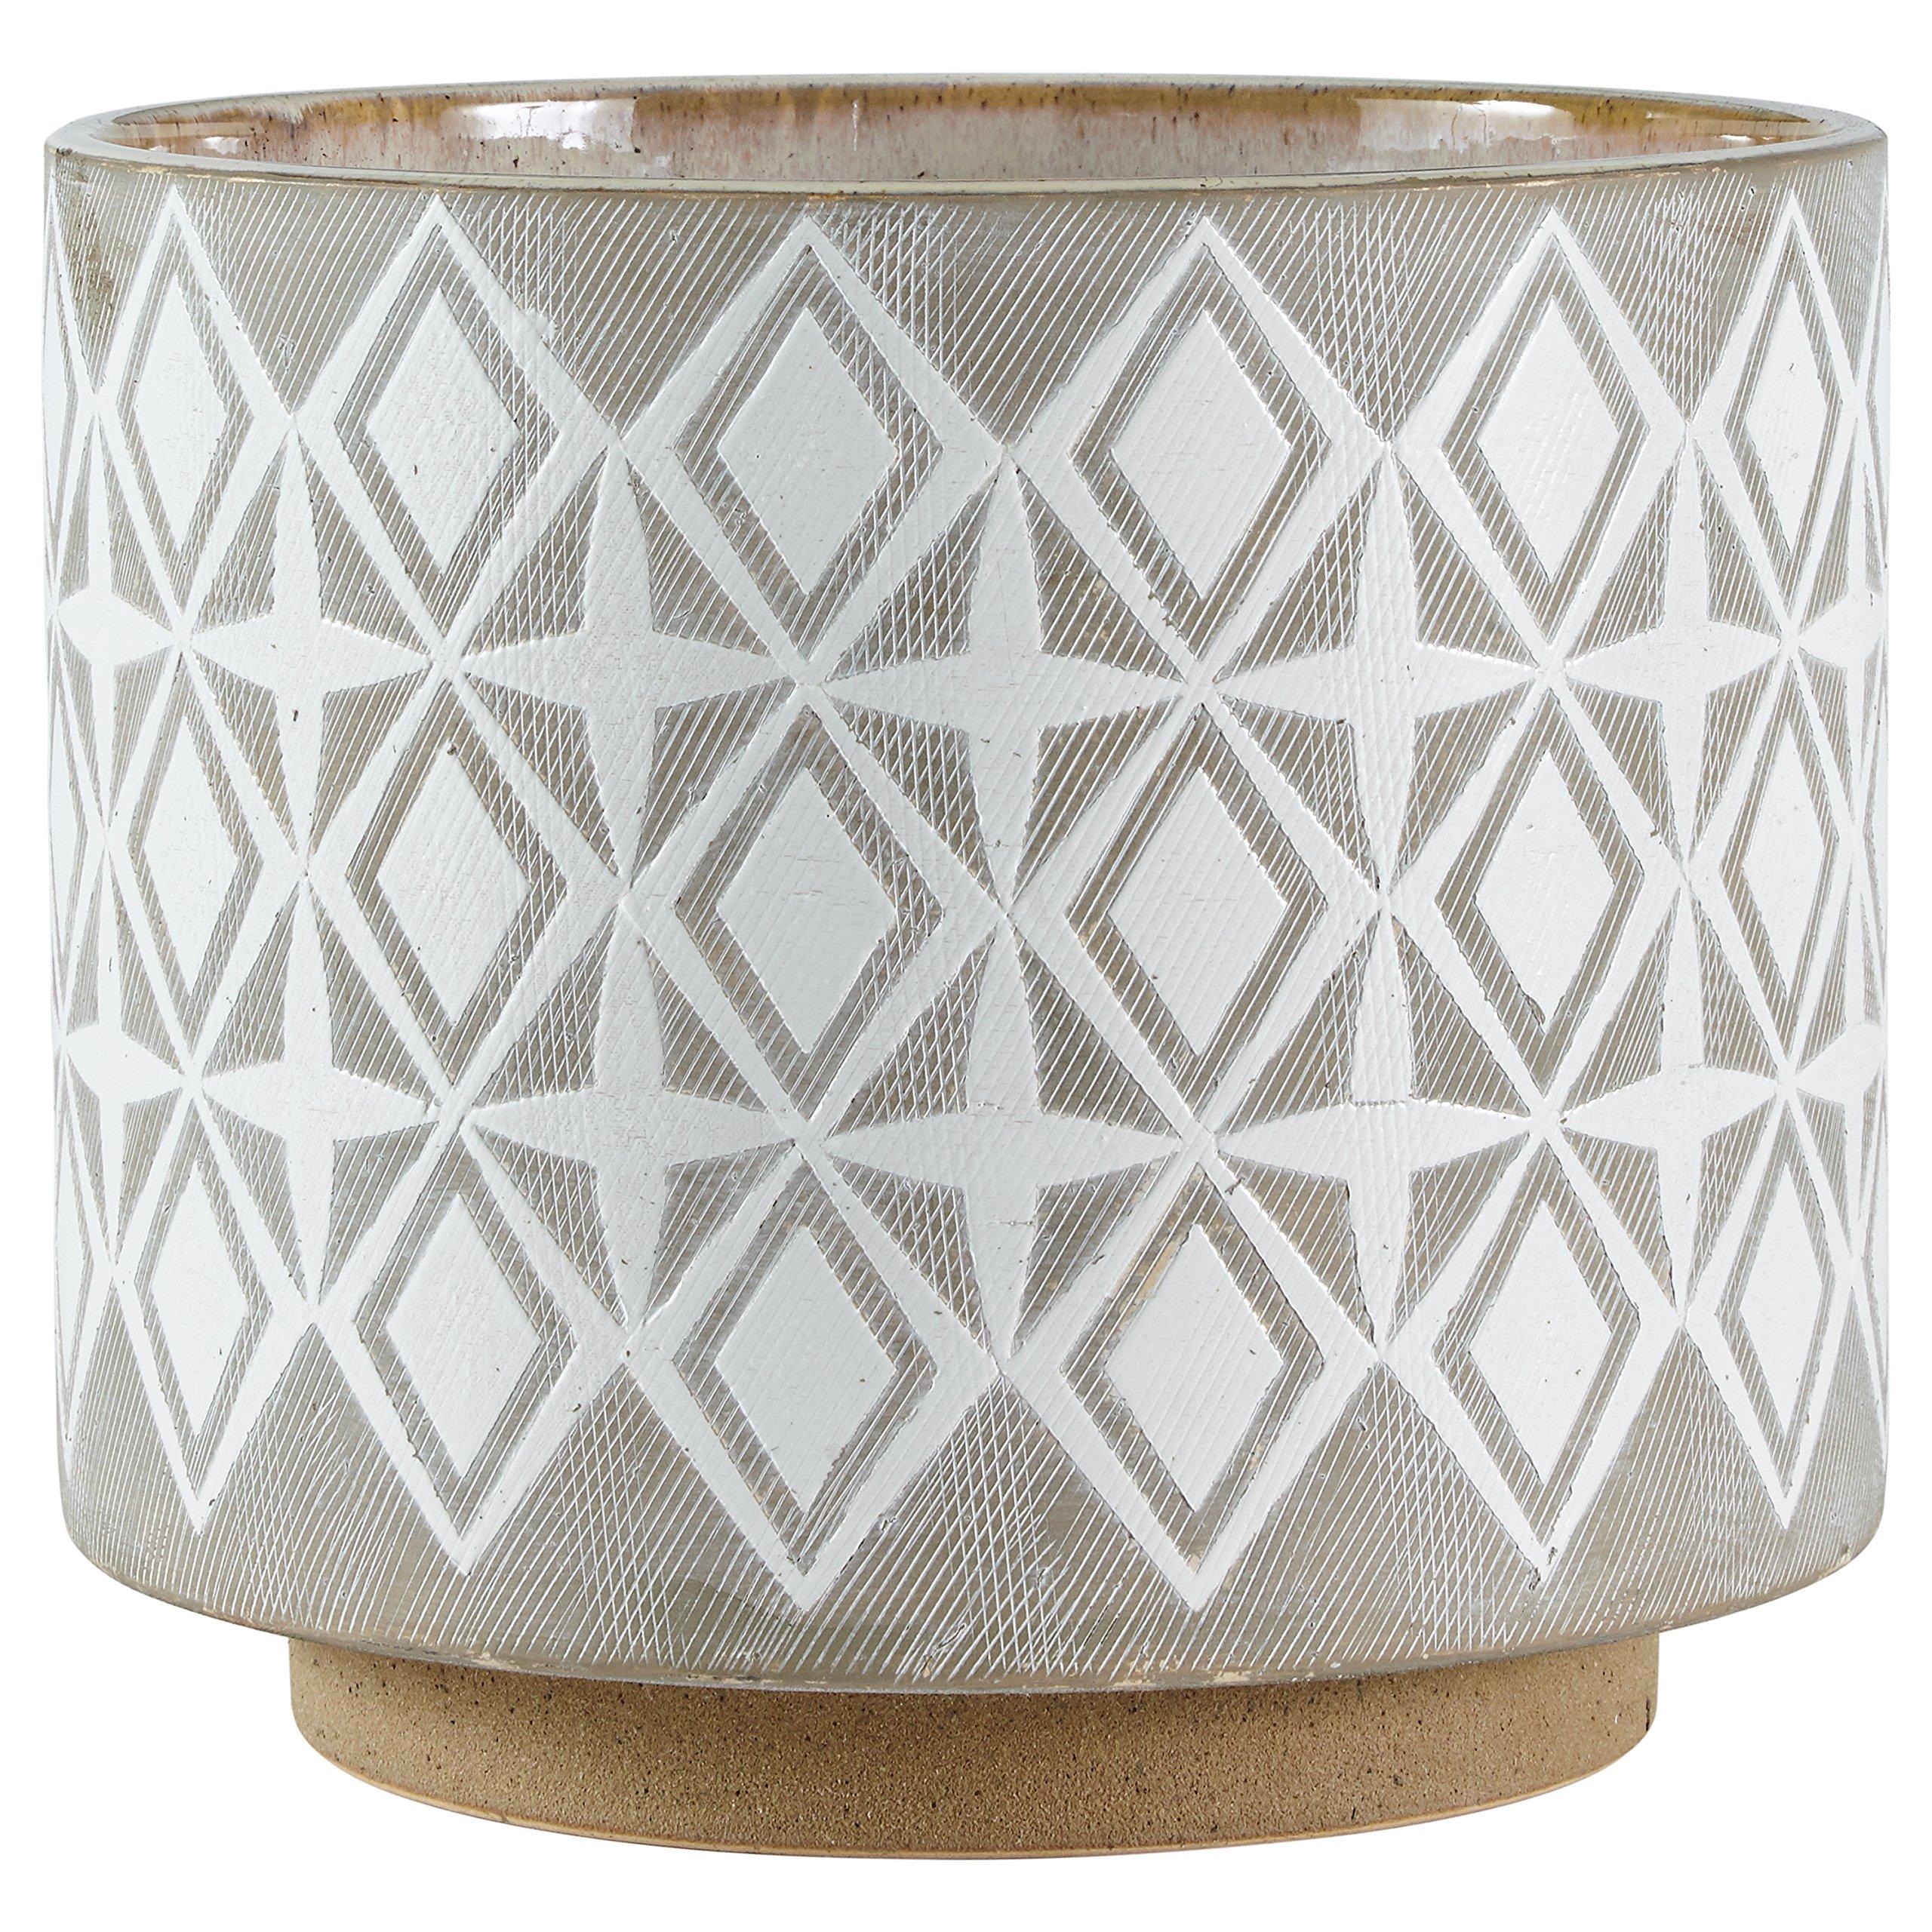 Rivet Geometric Ceramic Planter, 8.7''H, White and Grey